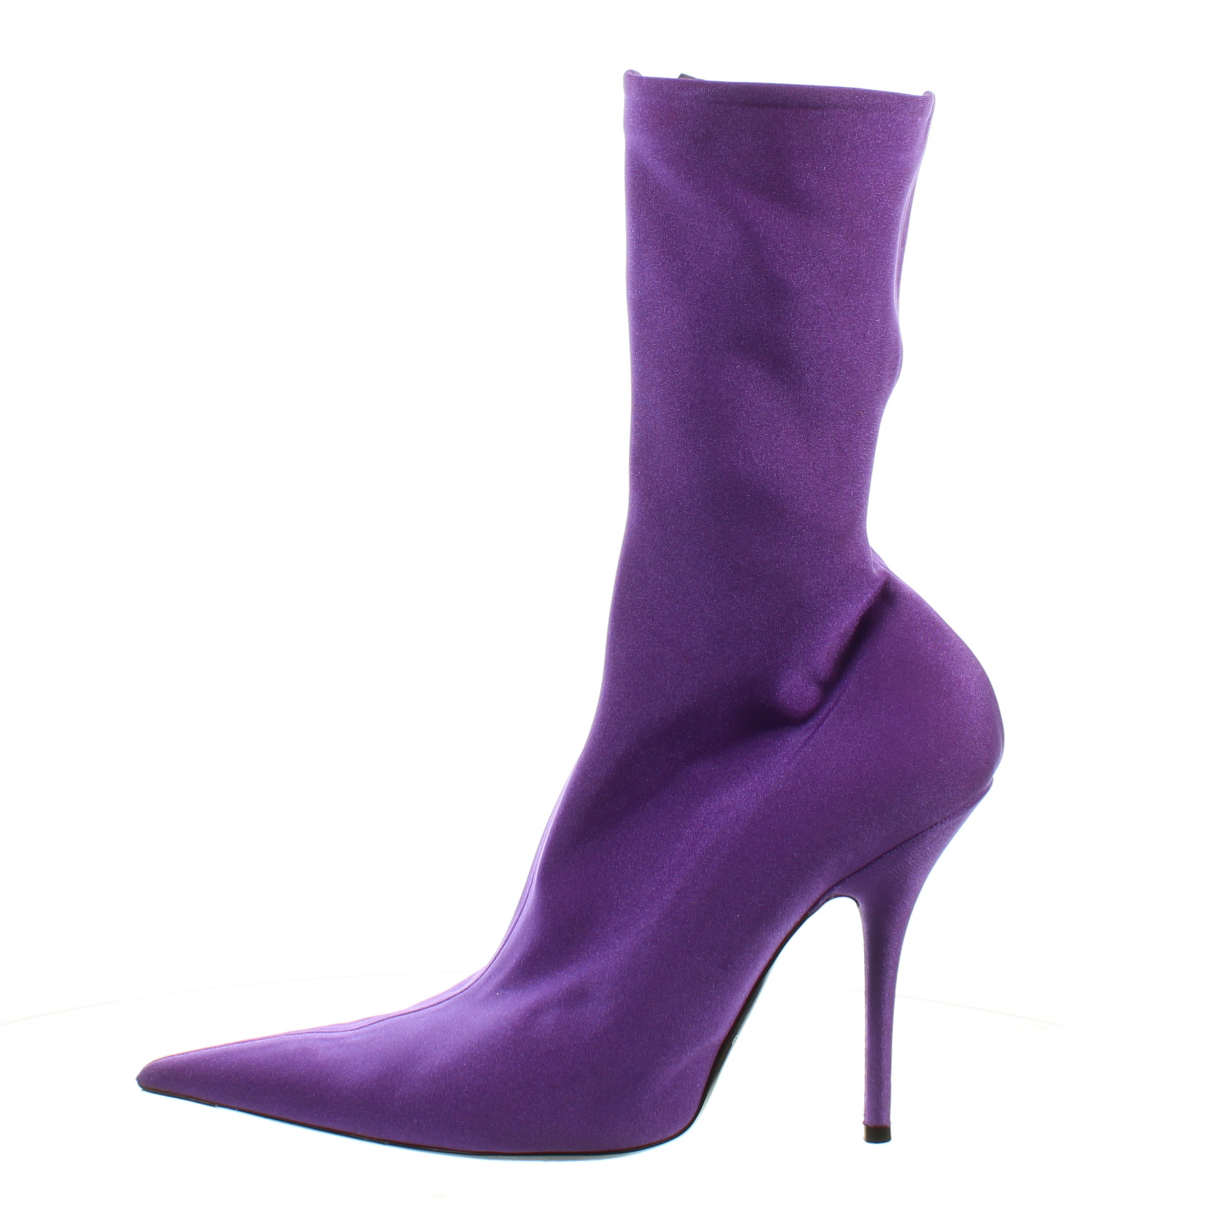 Balenciaga - Escarpins   pour femme en cuir - violet